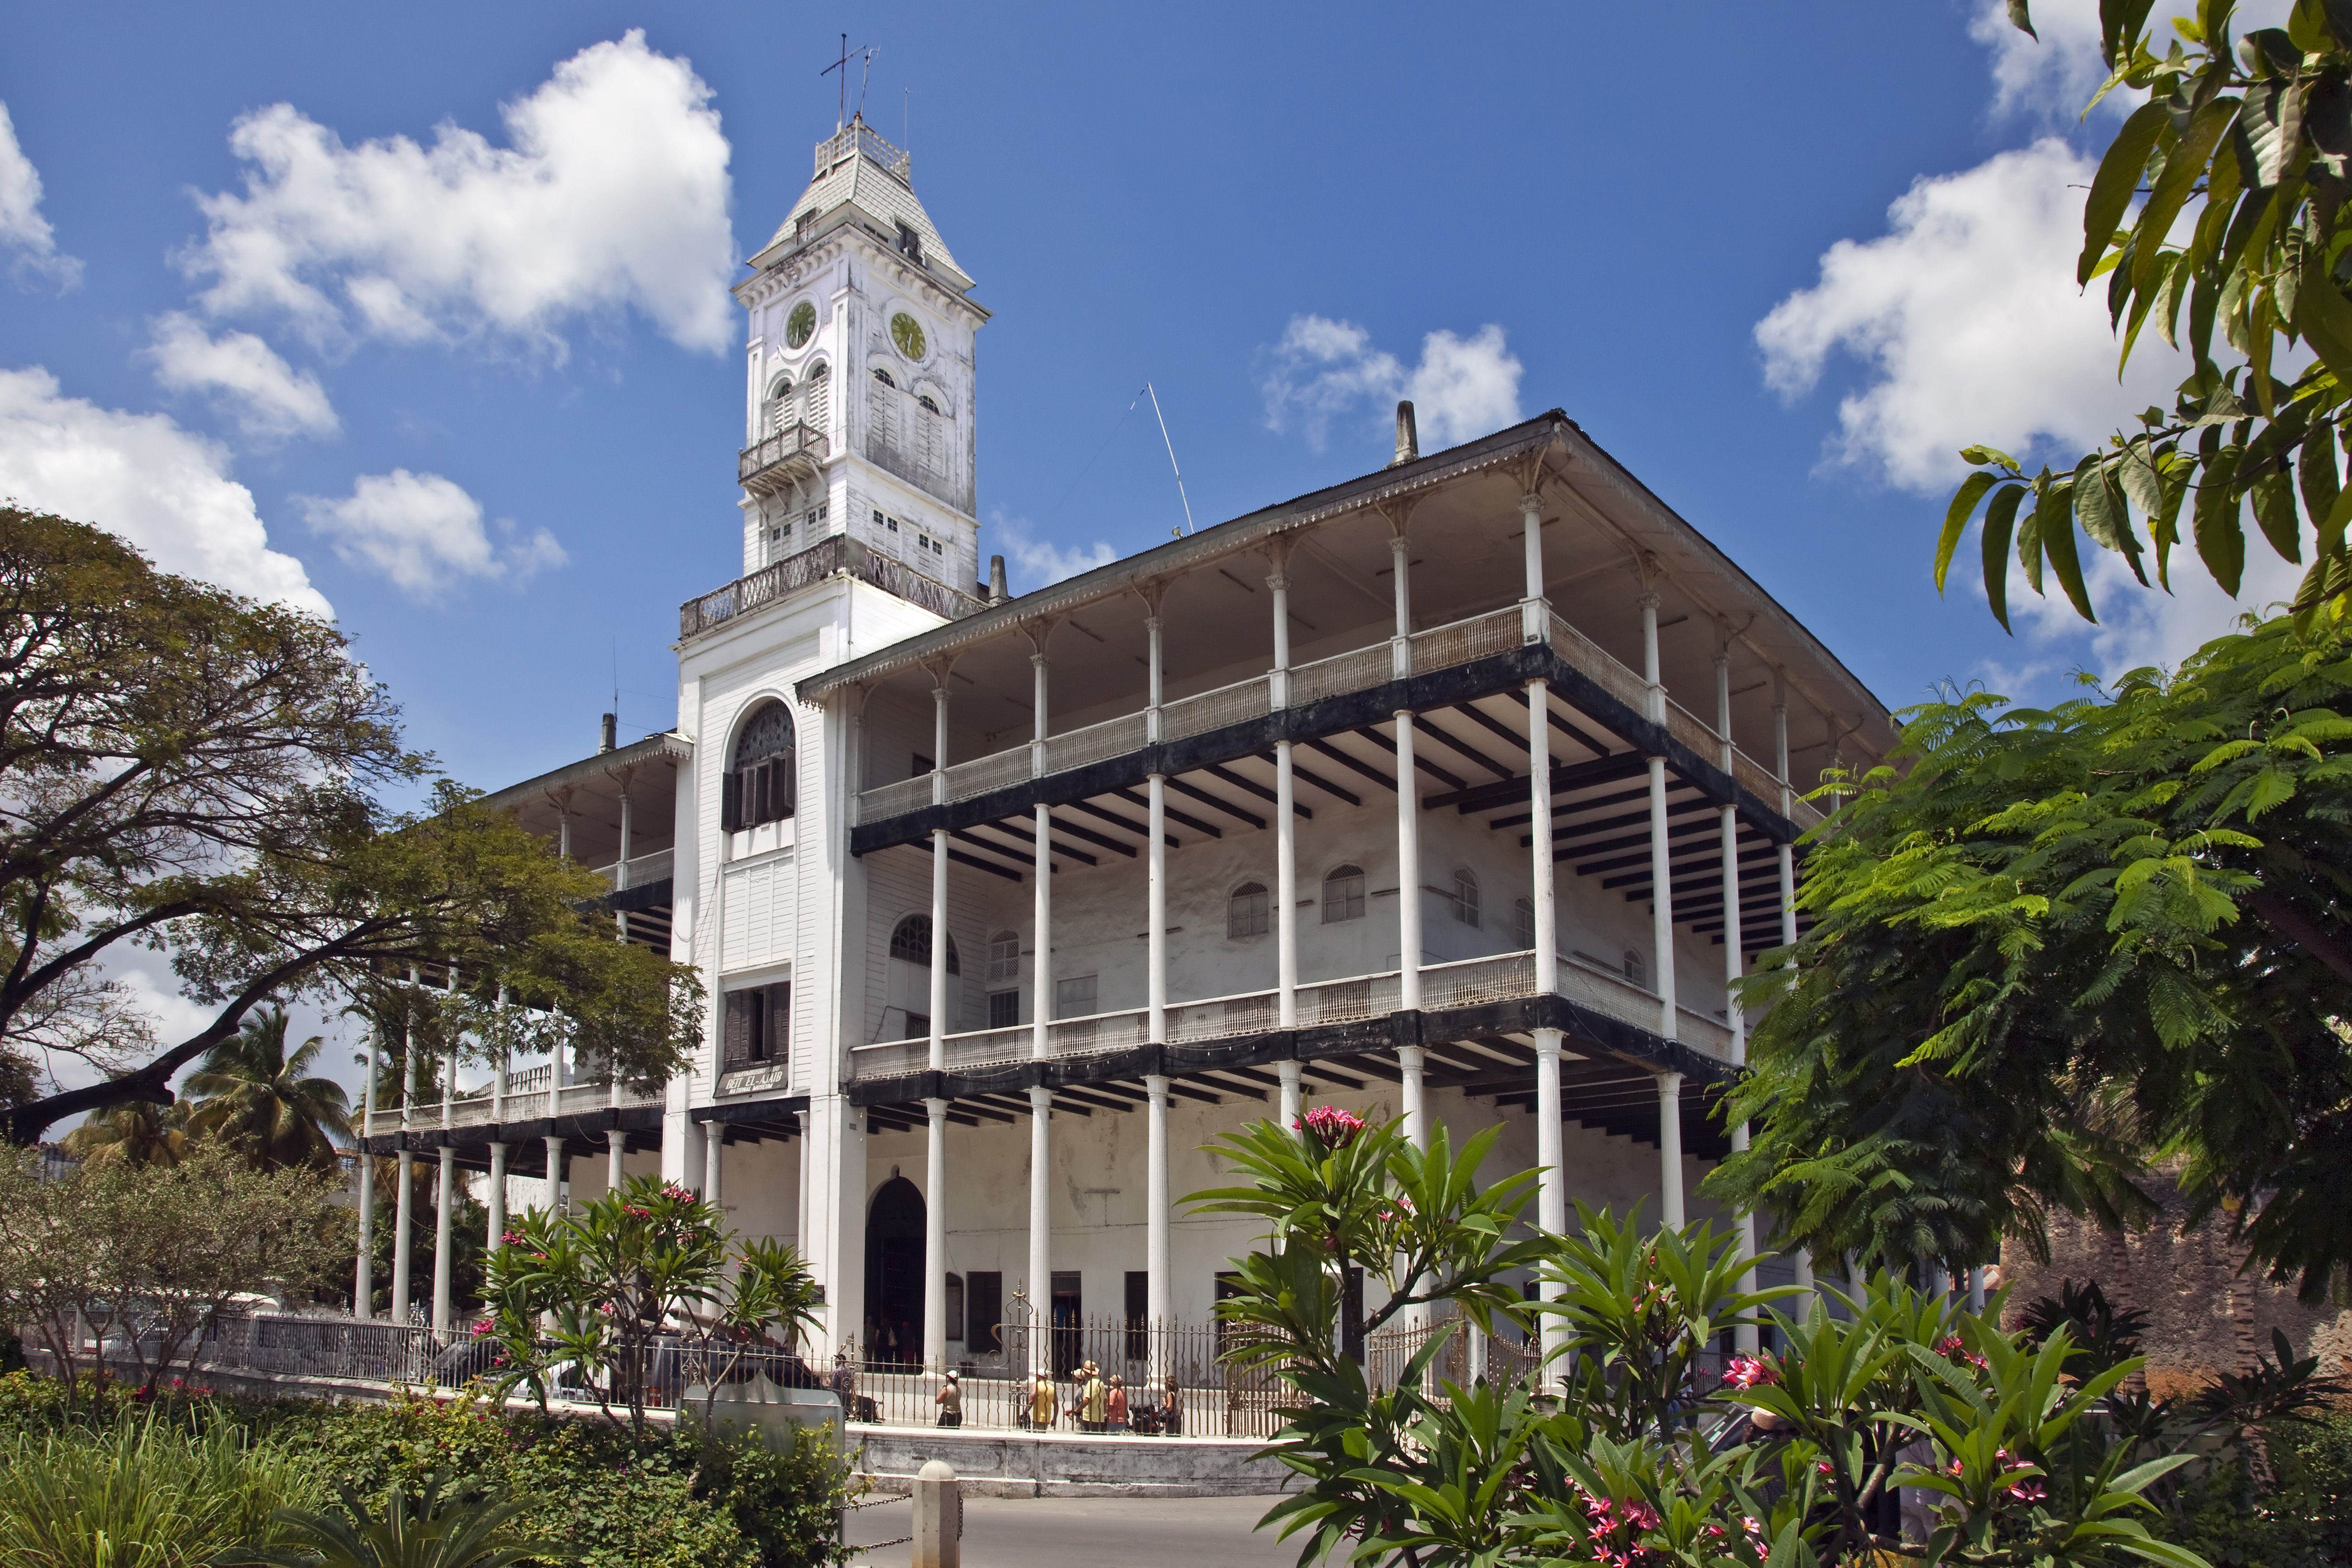 Beit al-ajaib or House of Wonders, Zanzibars best-known building. Built by Sultan Barghash 1883.